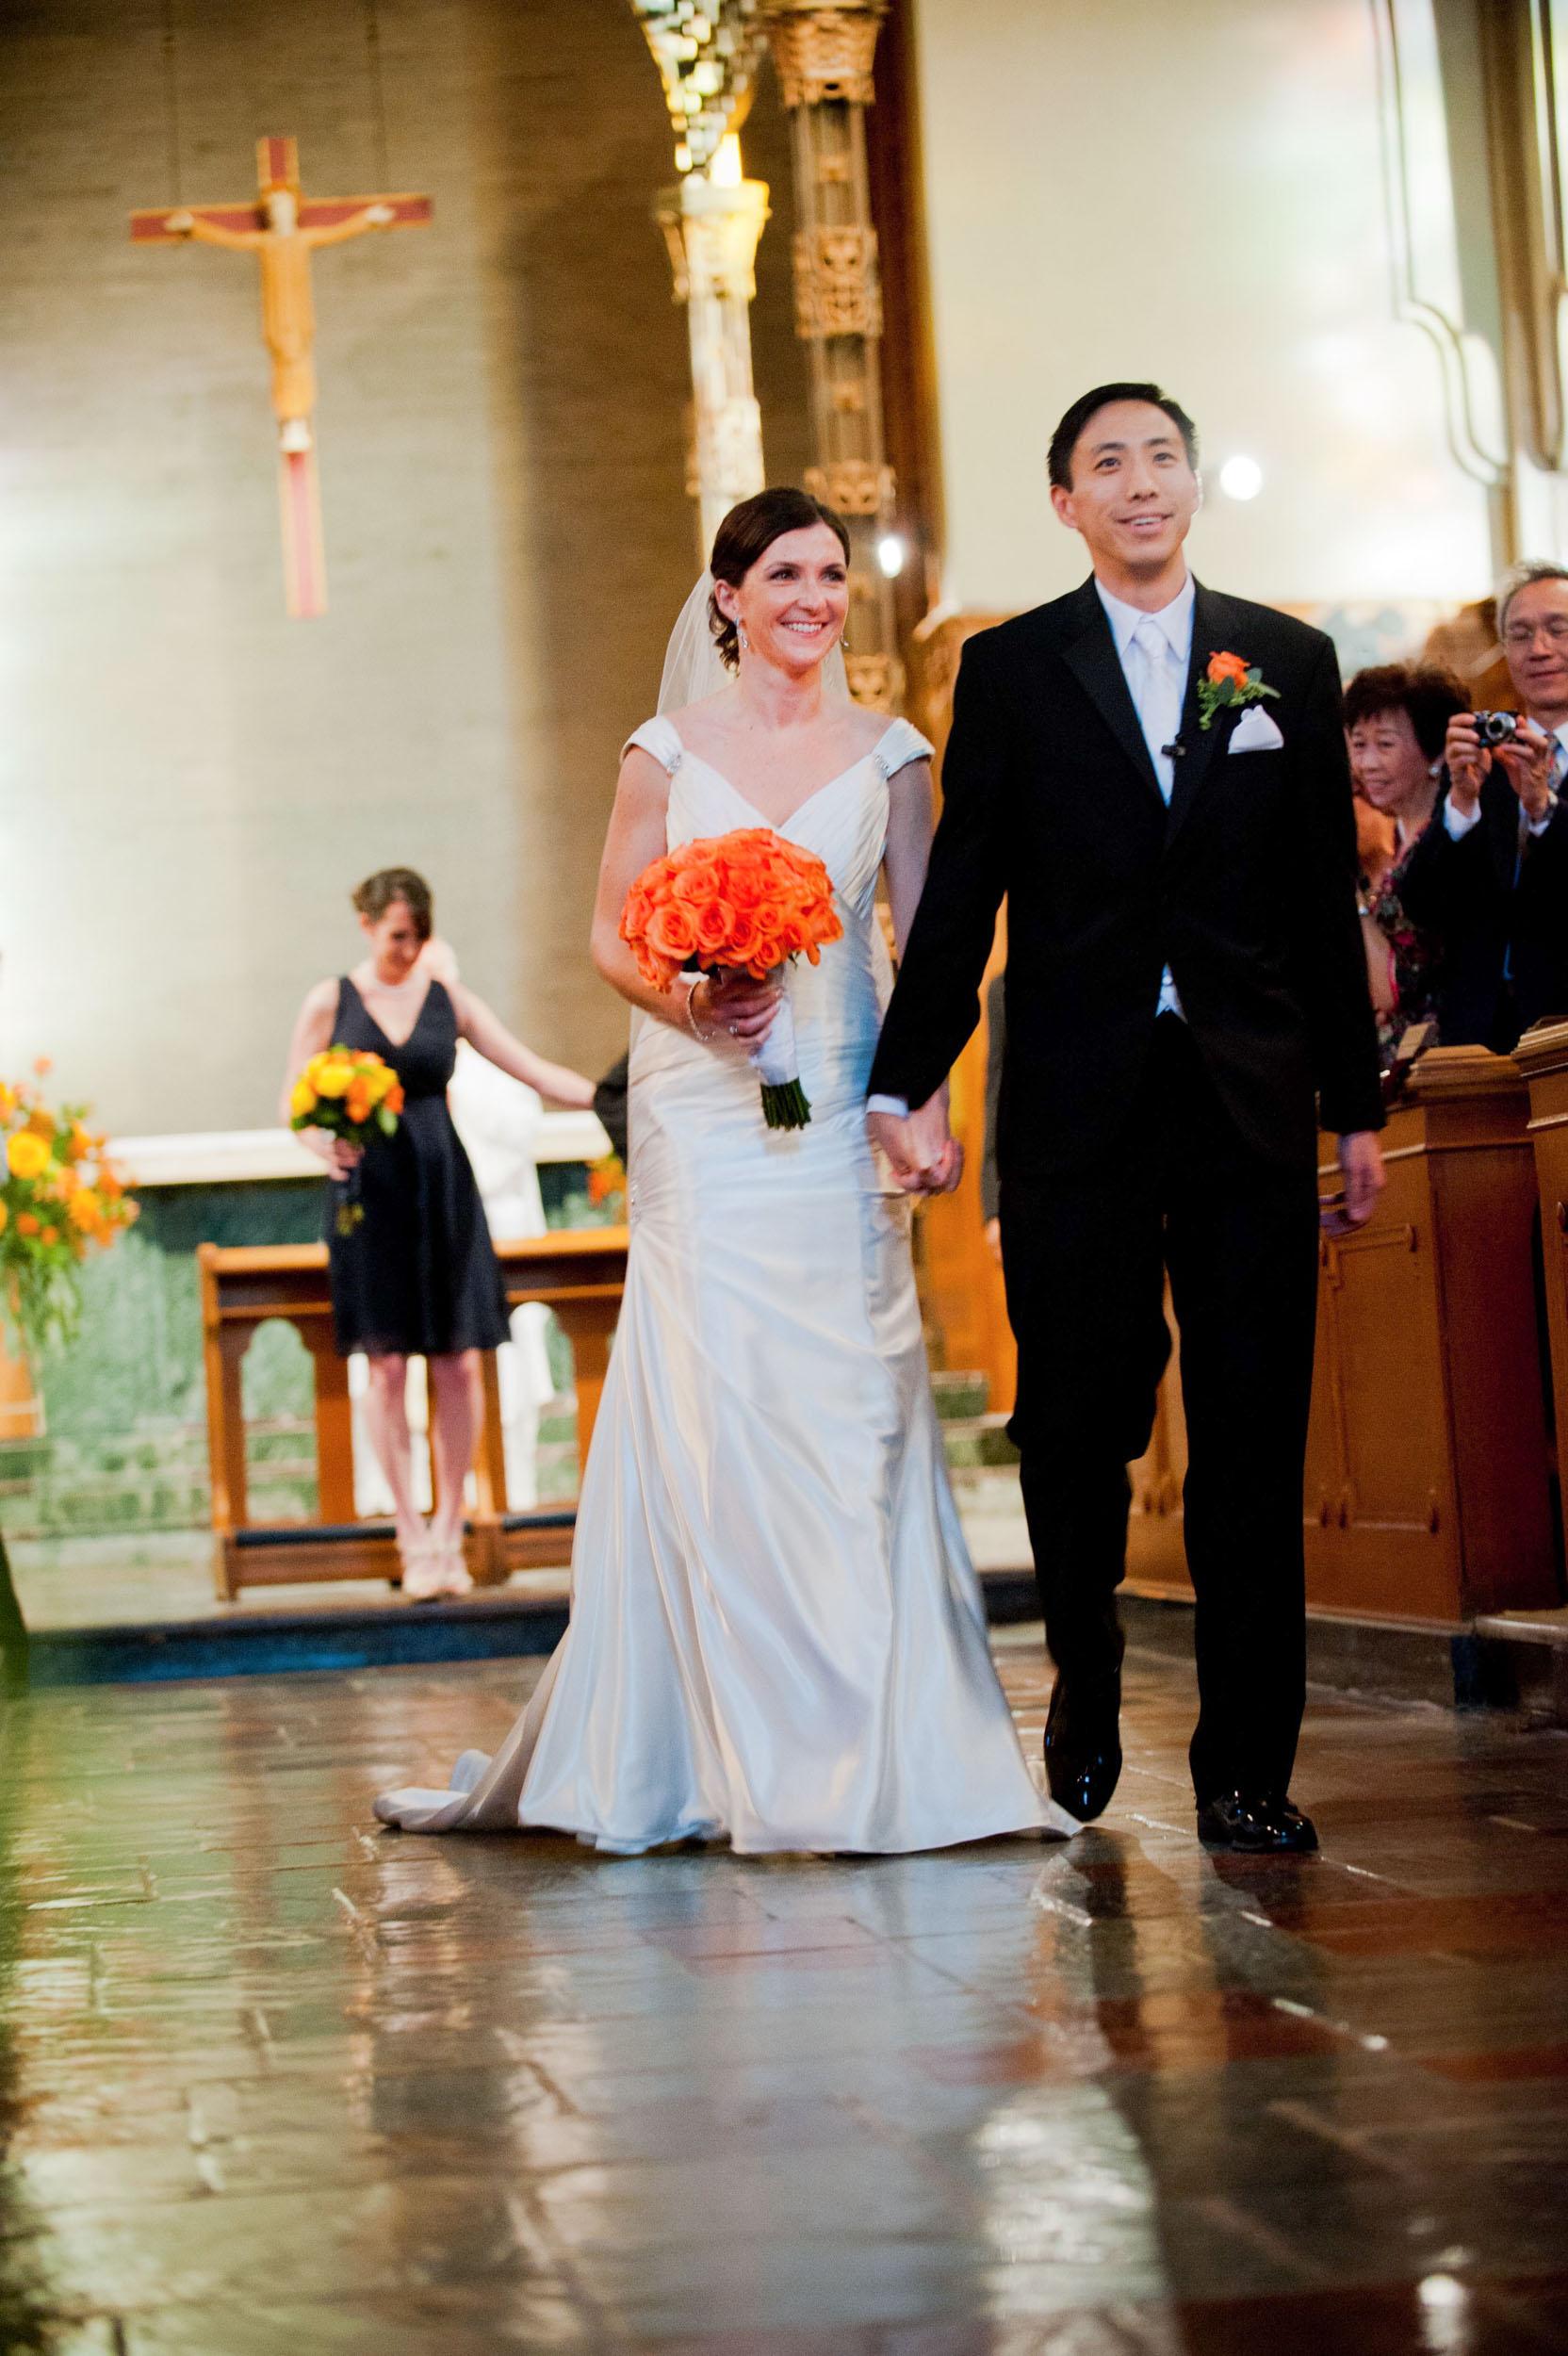 Wedding30_DSC1026-2.jpg